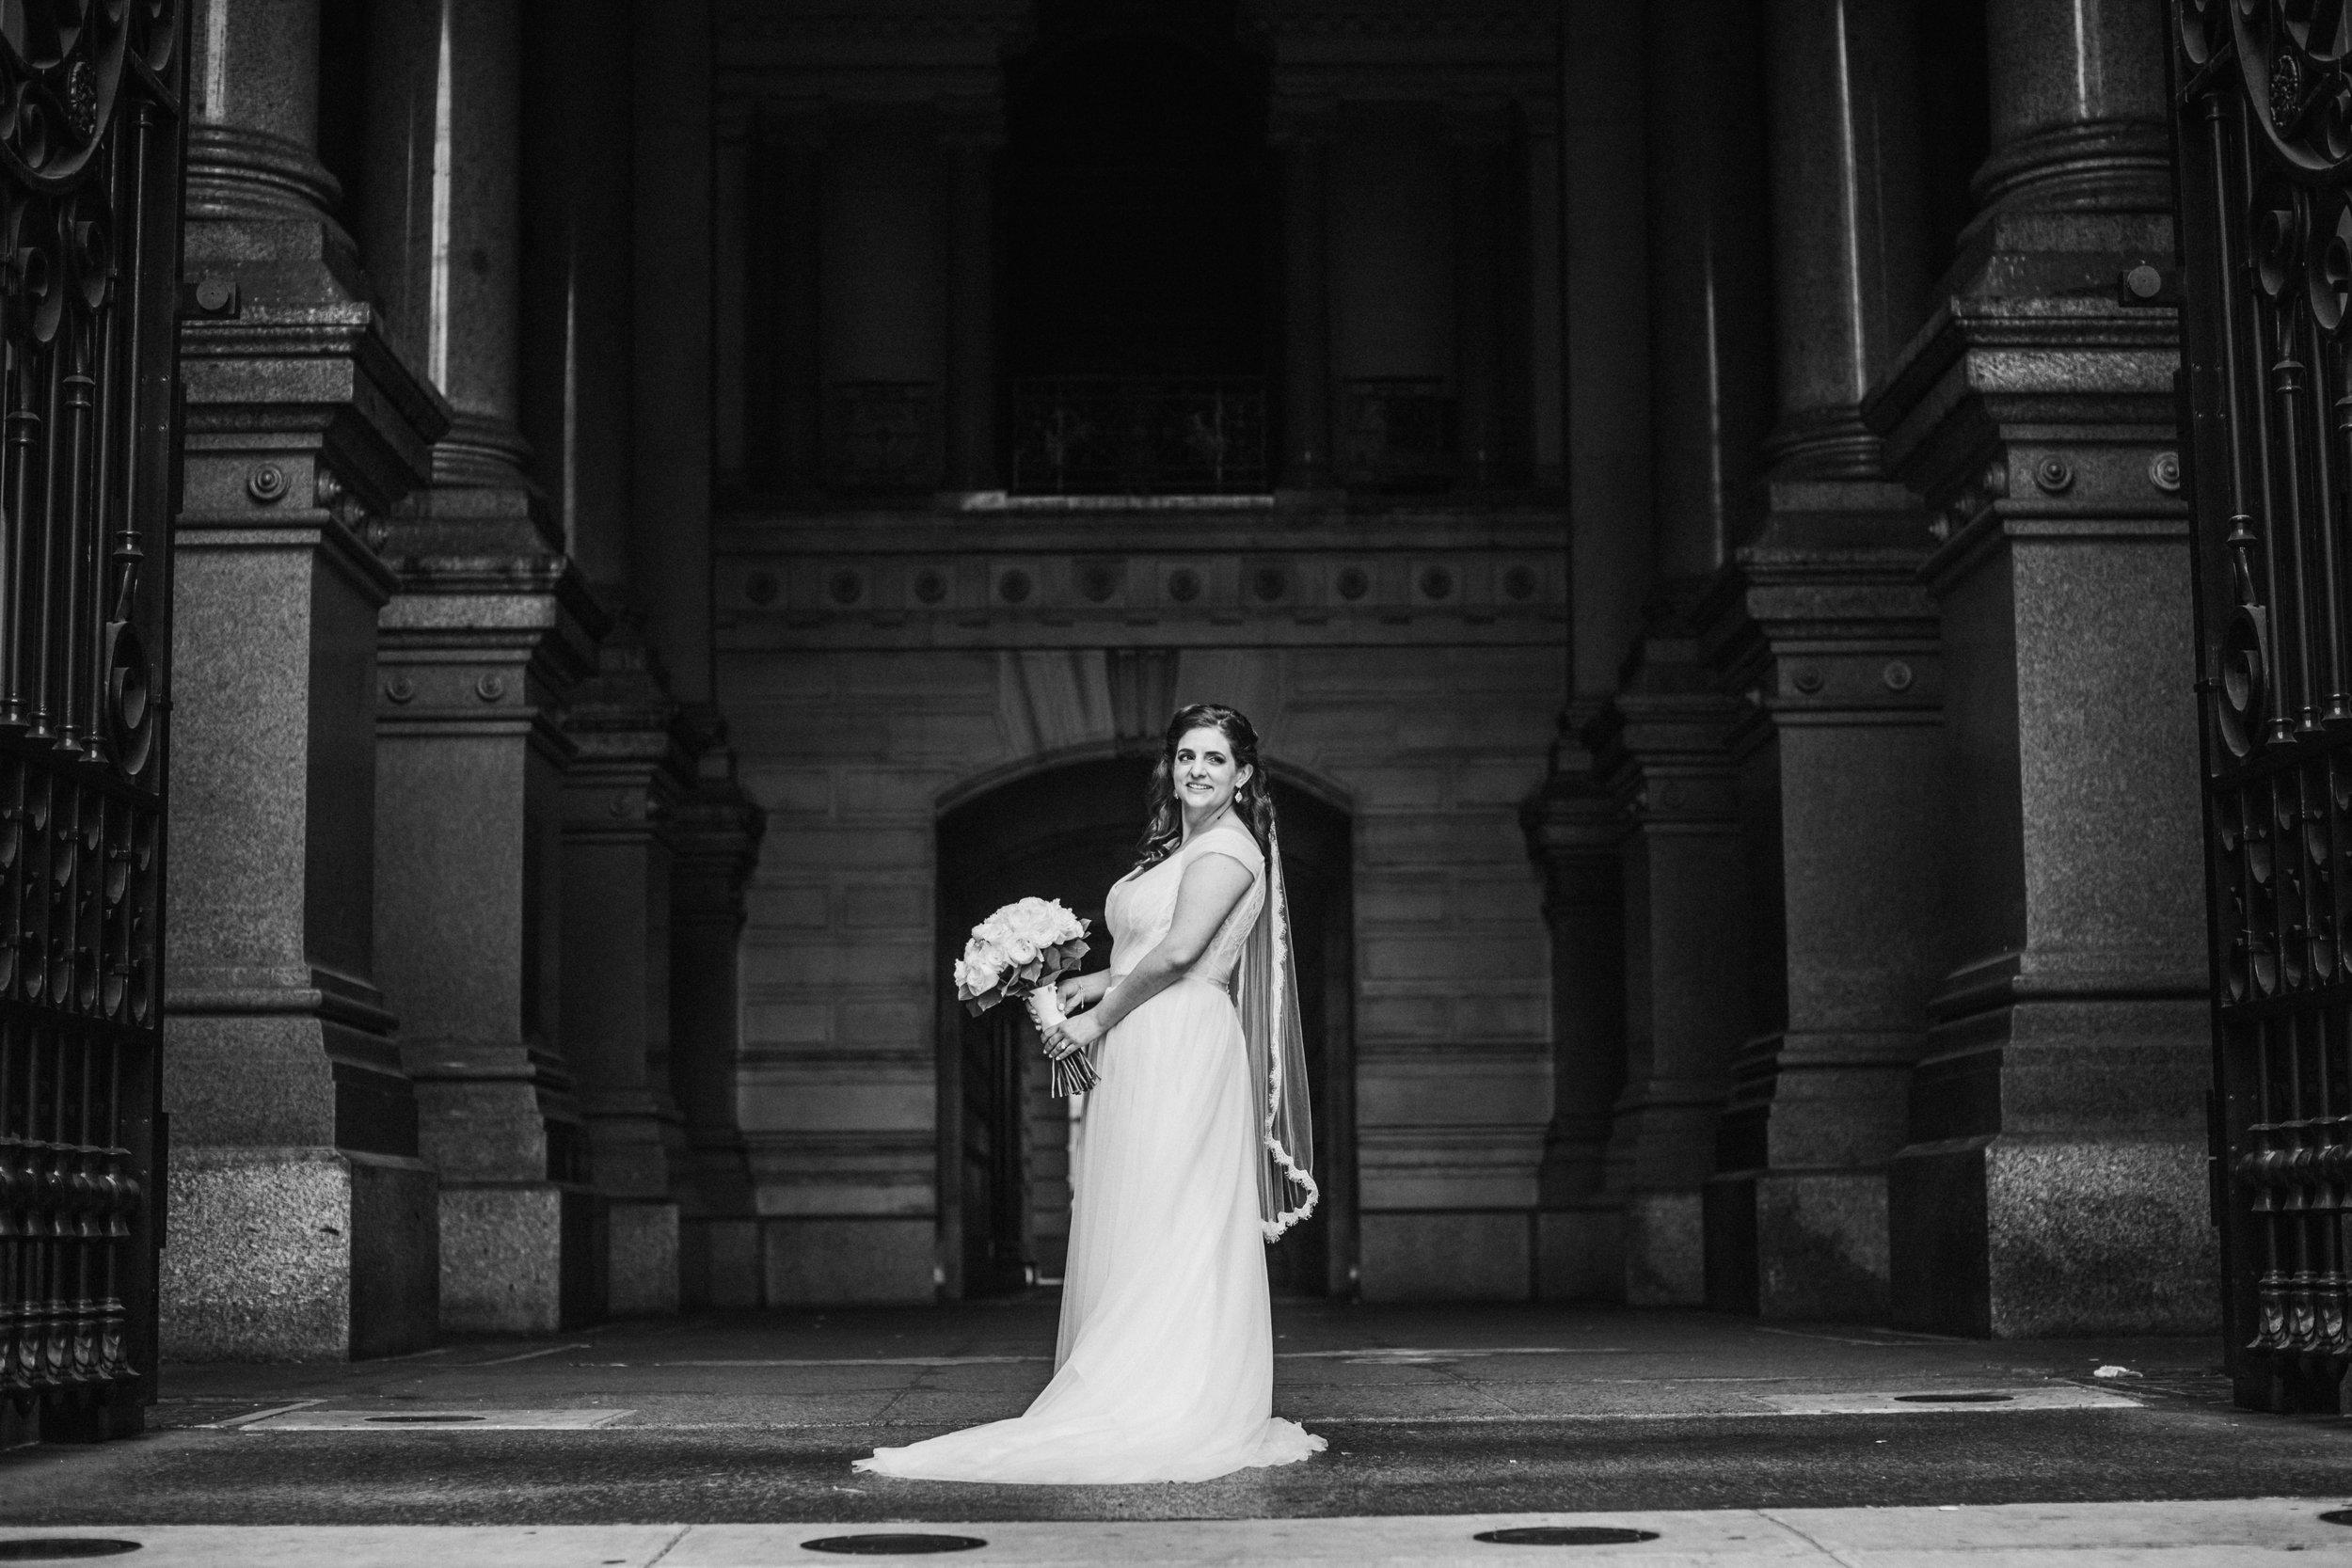 JennaLynnPhotography-NJWeddingPhotographer-Philadelphia-Wedding-ArtsBallroom-Bride&GroomBW-30.jpg